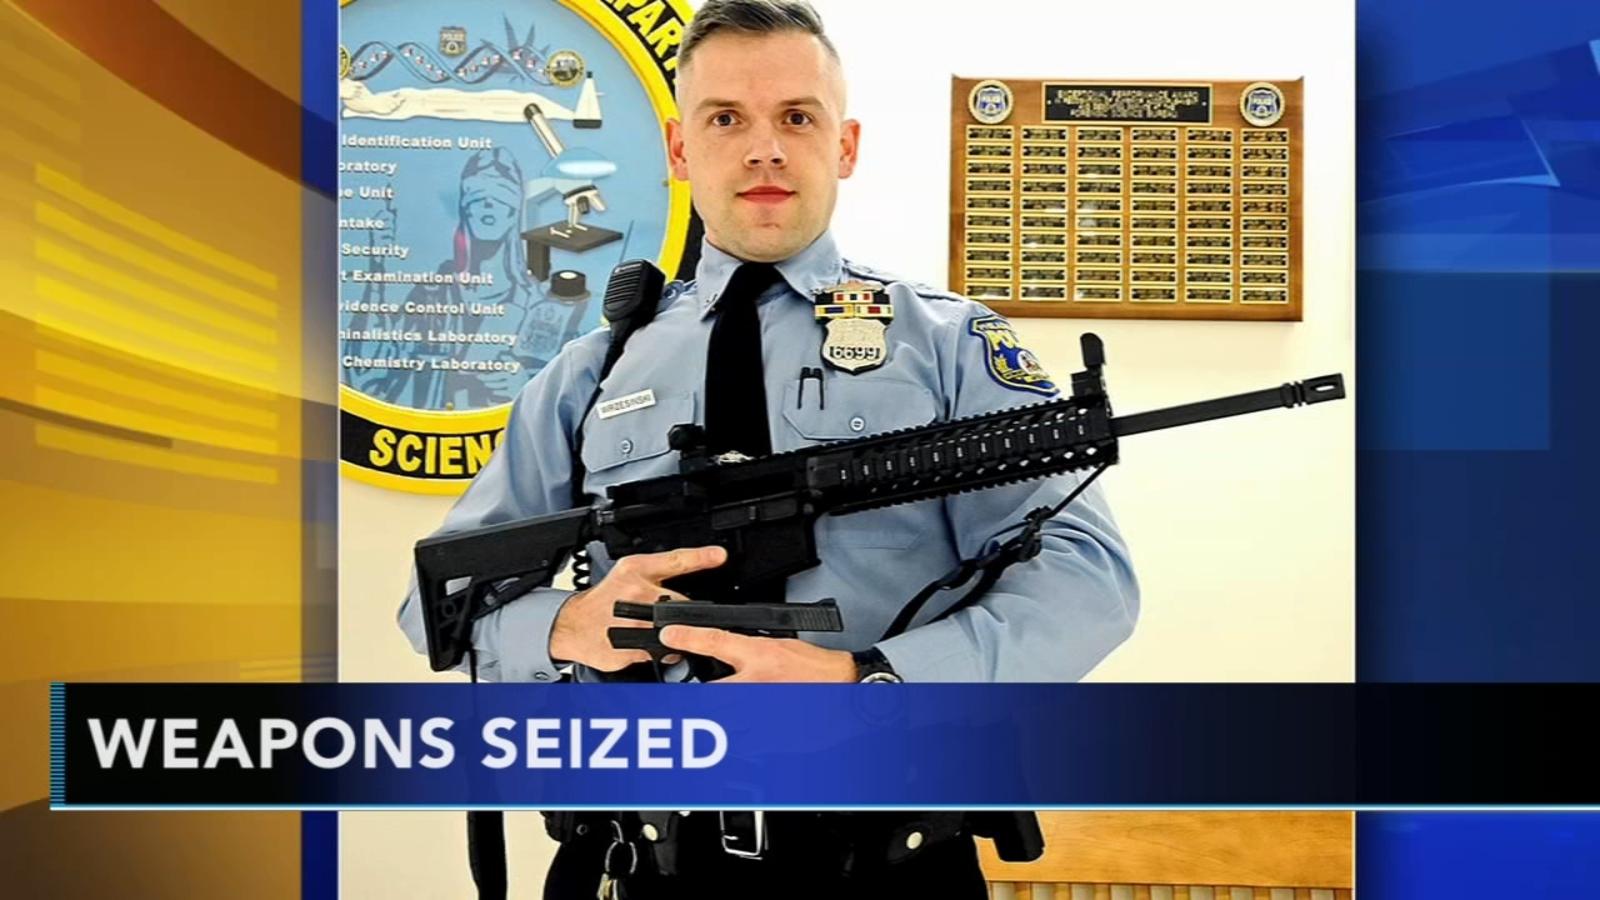 Philadelphia police arrest boy walking with AR-15, teen with pistol